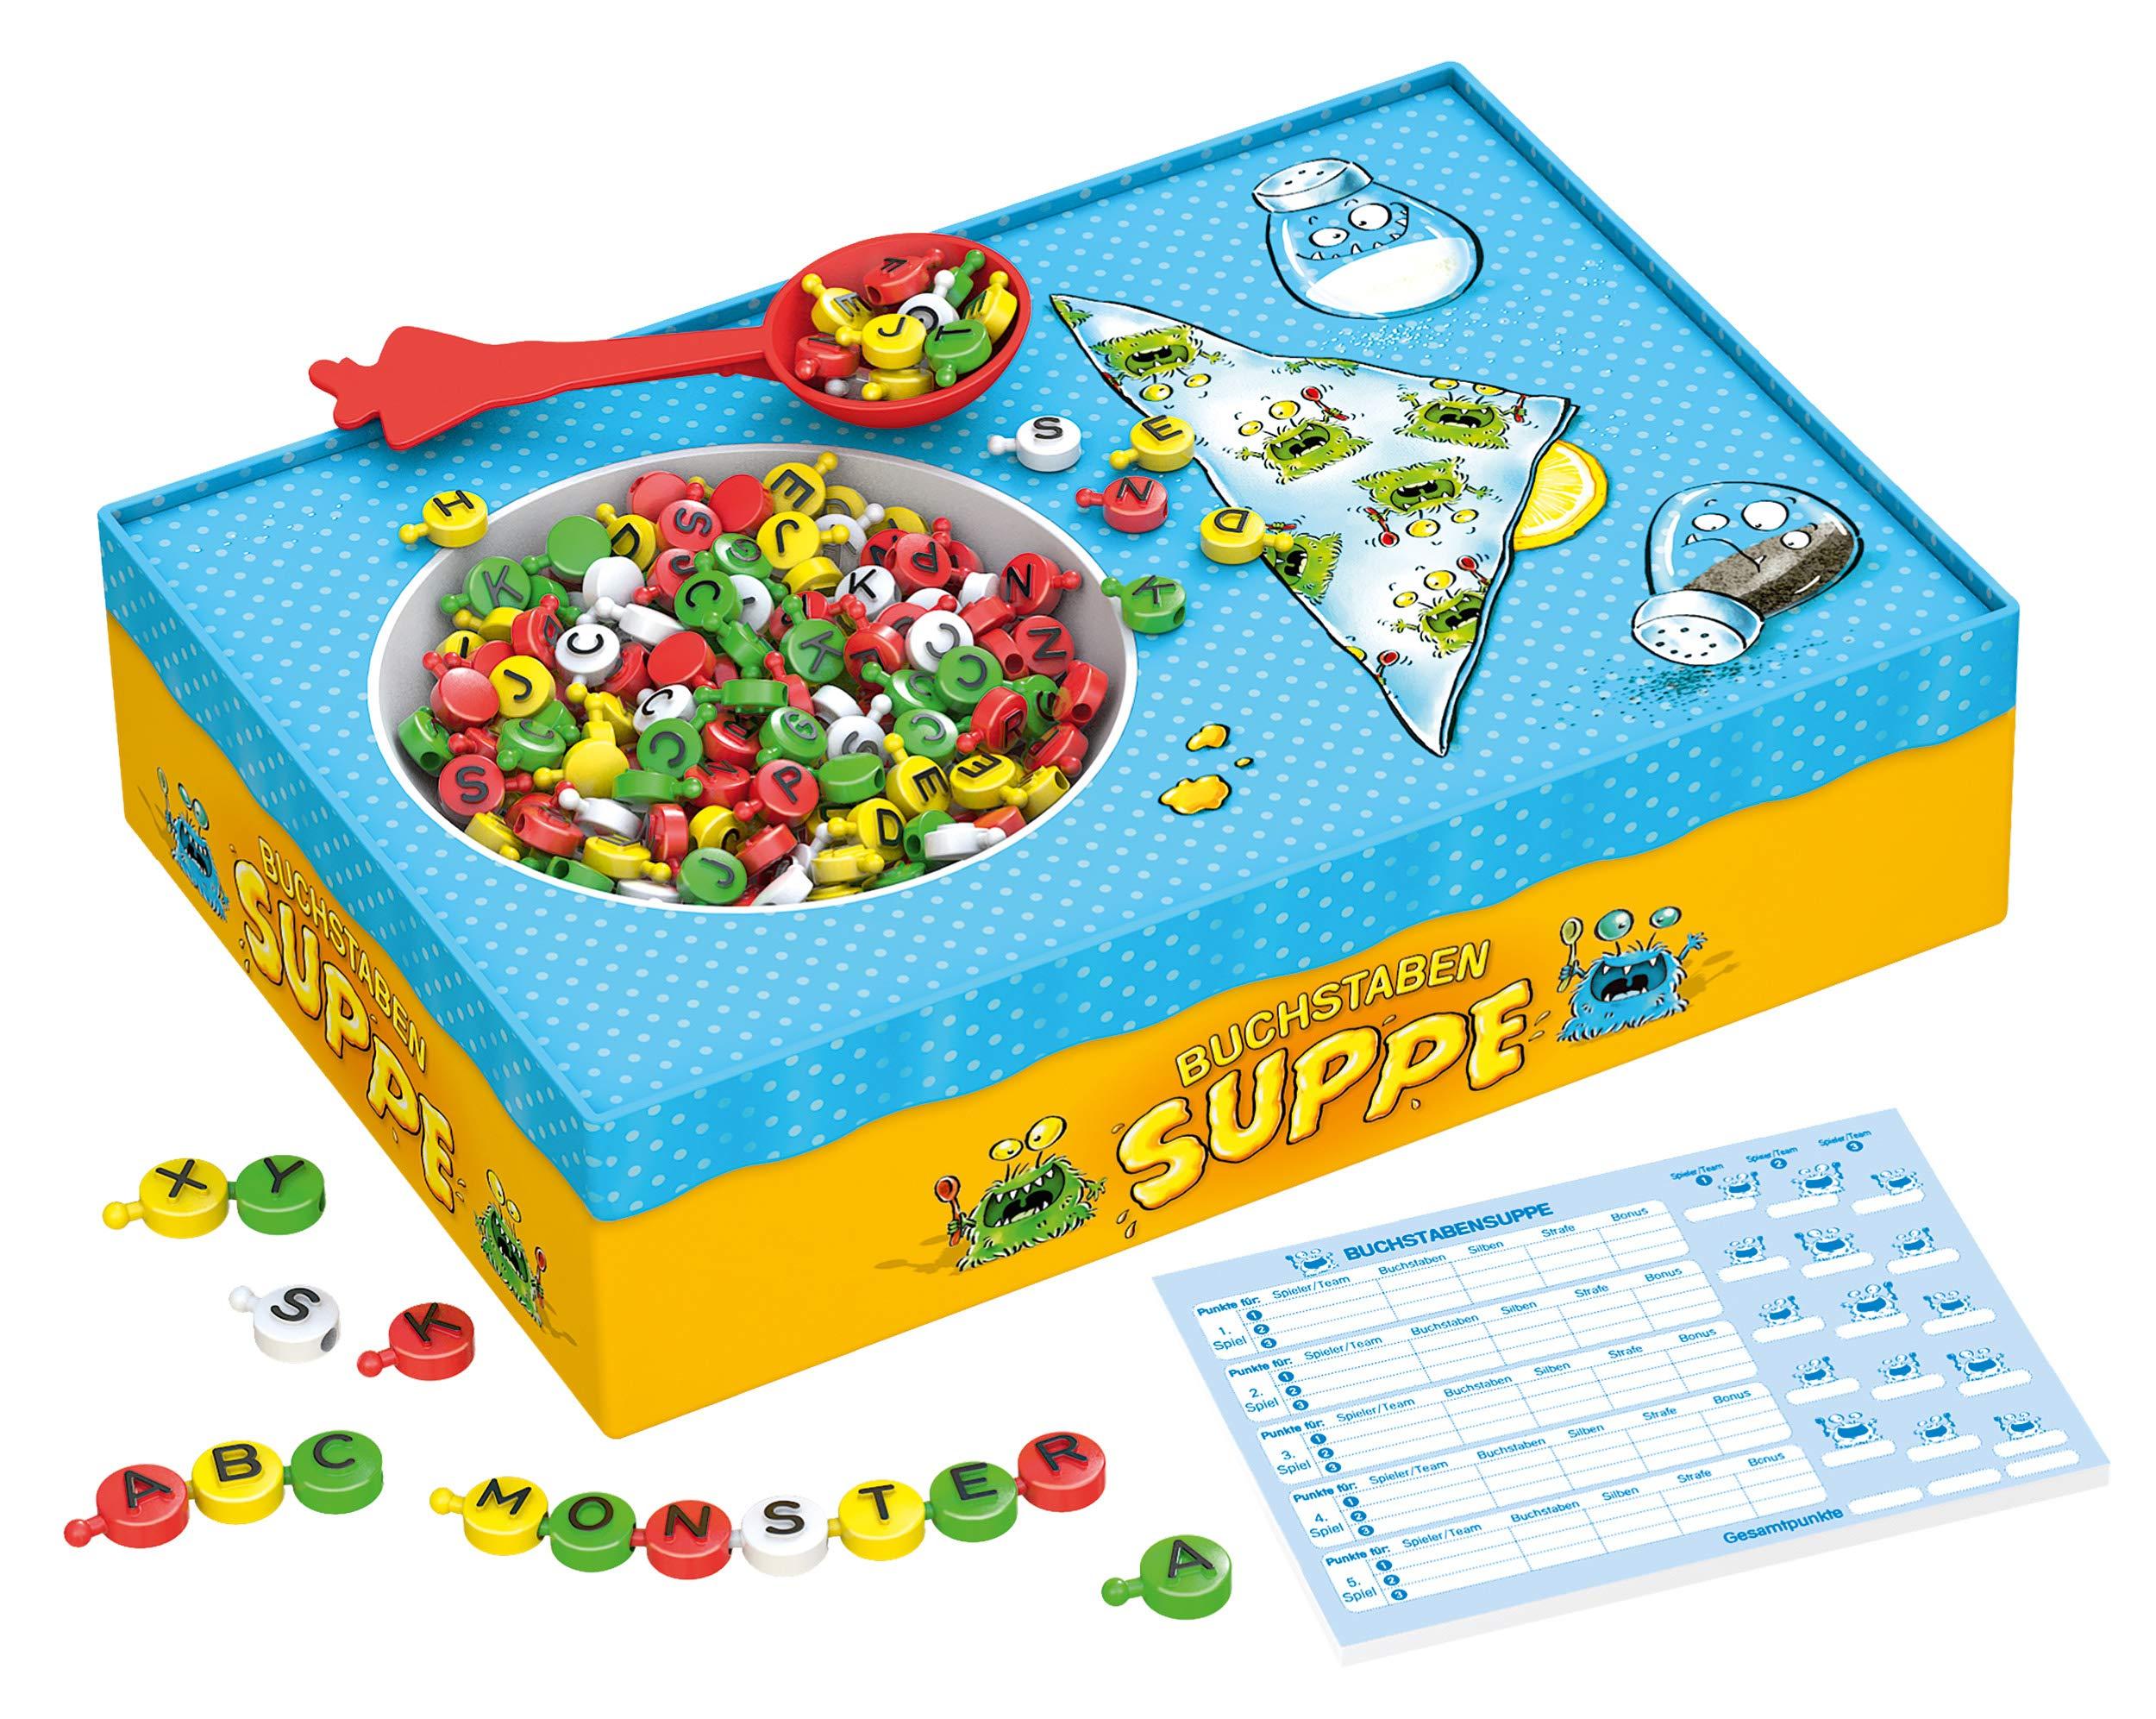 Schmidt-Spiele-40533-Buchstabensuppe-Kinderspiel-bunt